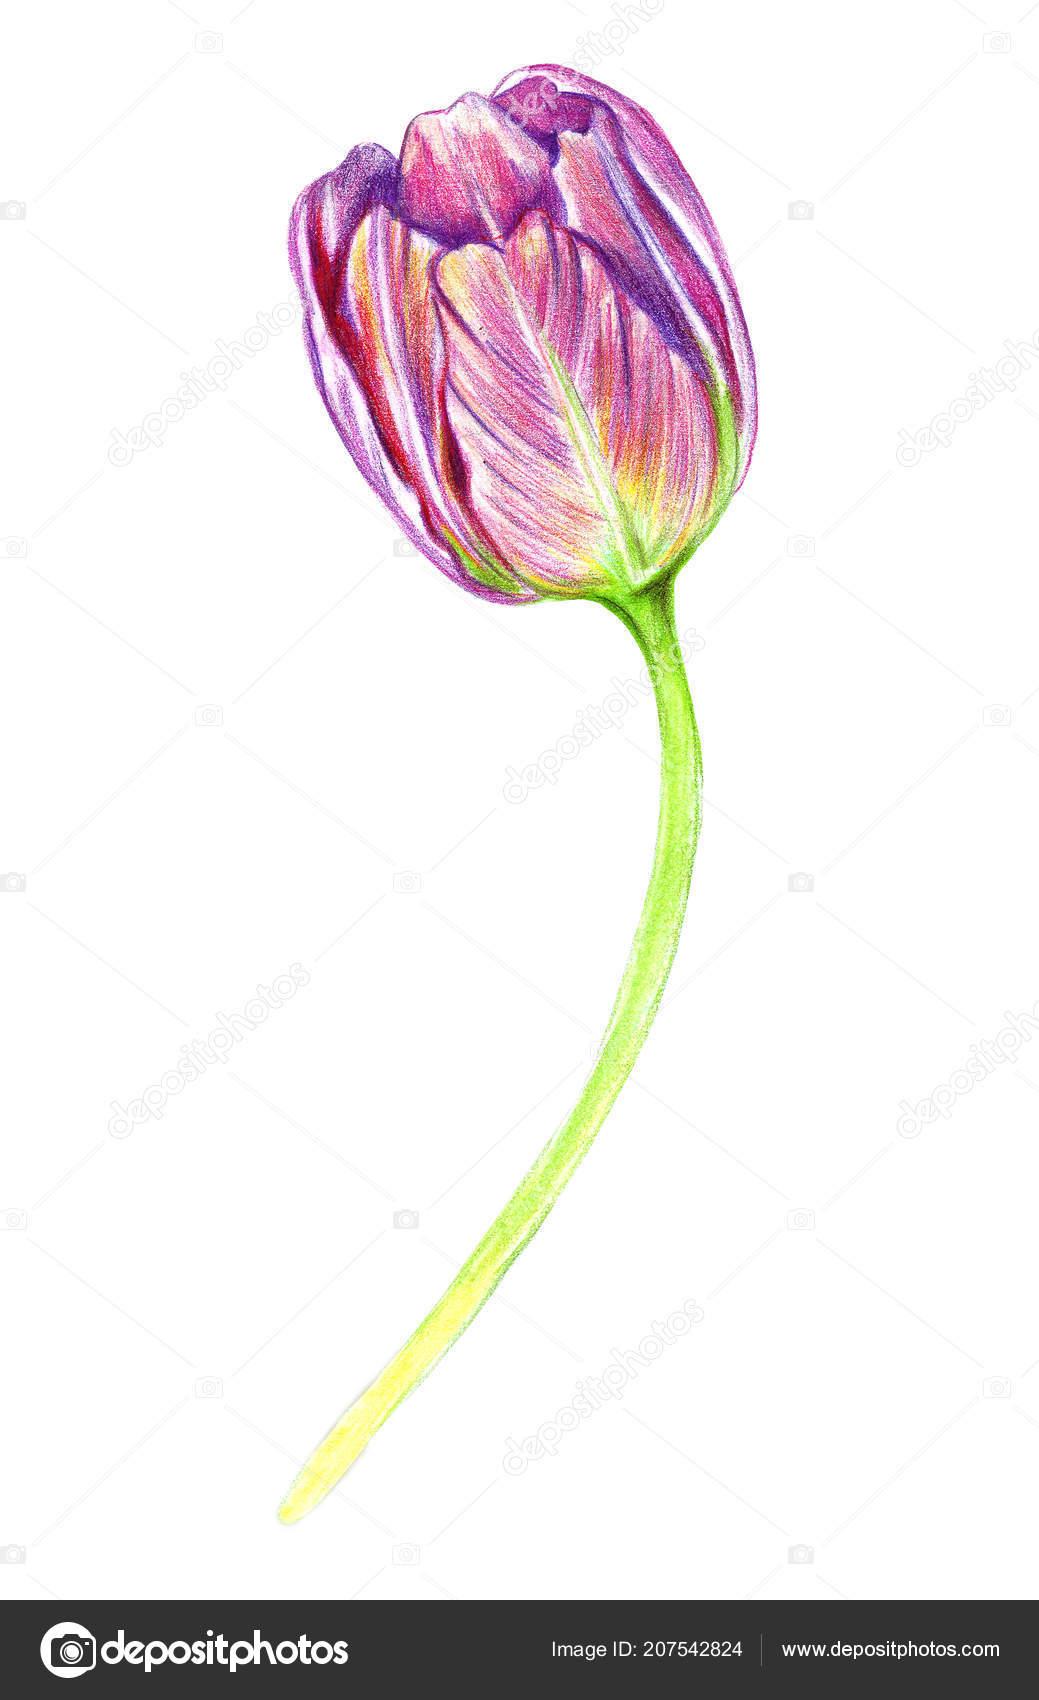 Main Dessin Dune Tulipe Réaliste Photographie Tnata2009 207542824